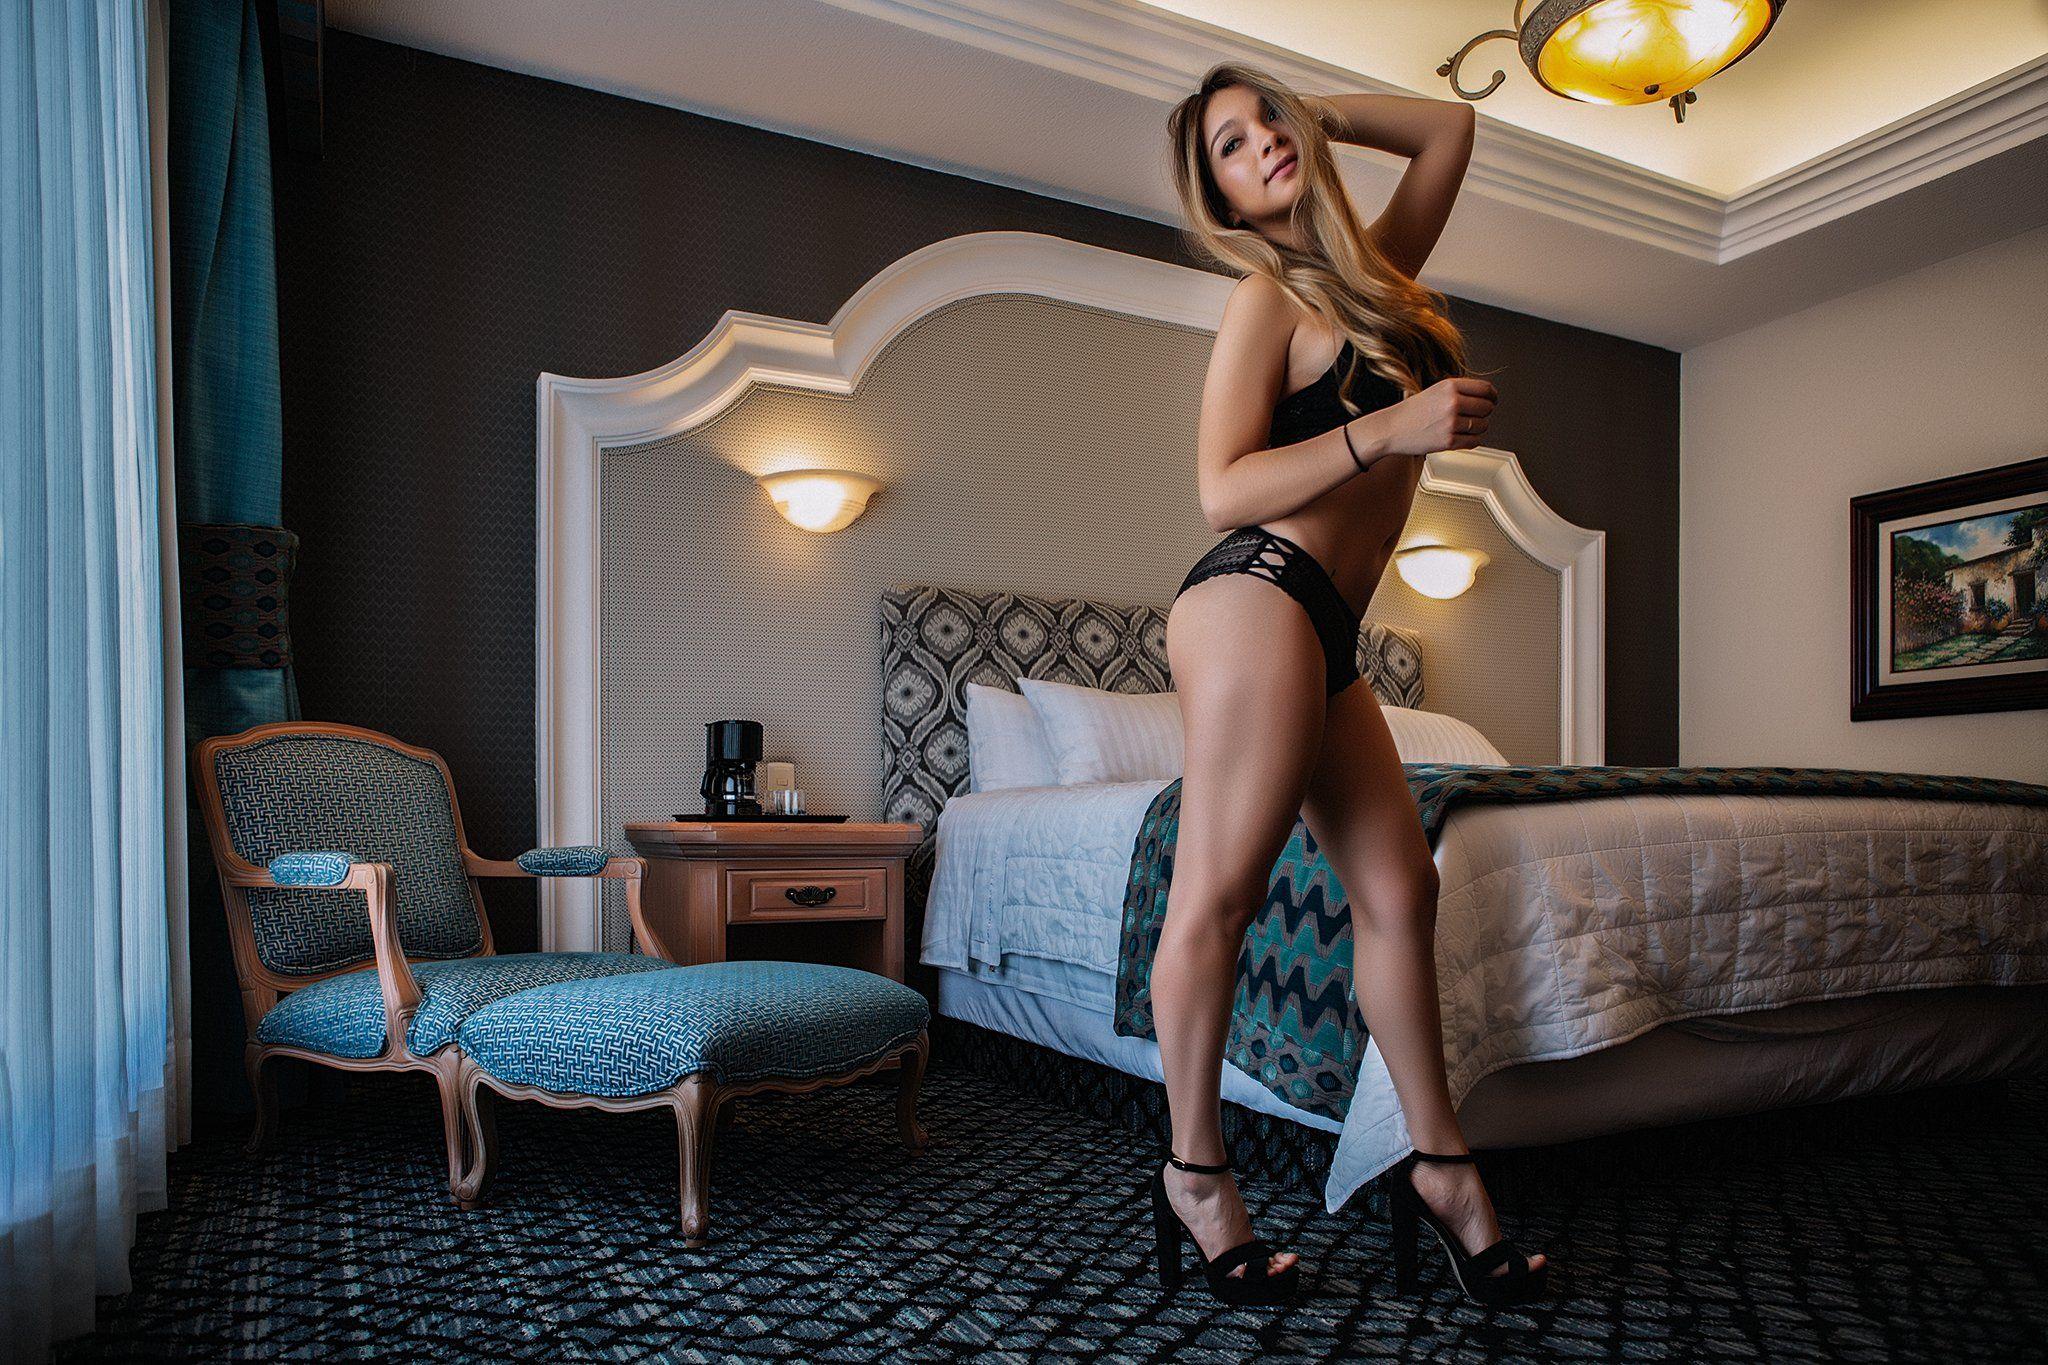 sexy, portrait, cute, beautiful, latin, girl, model, cute, hot, сексуальный, чувственный, горячий, Luis Gastón